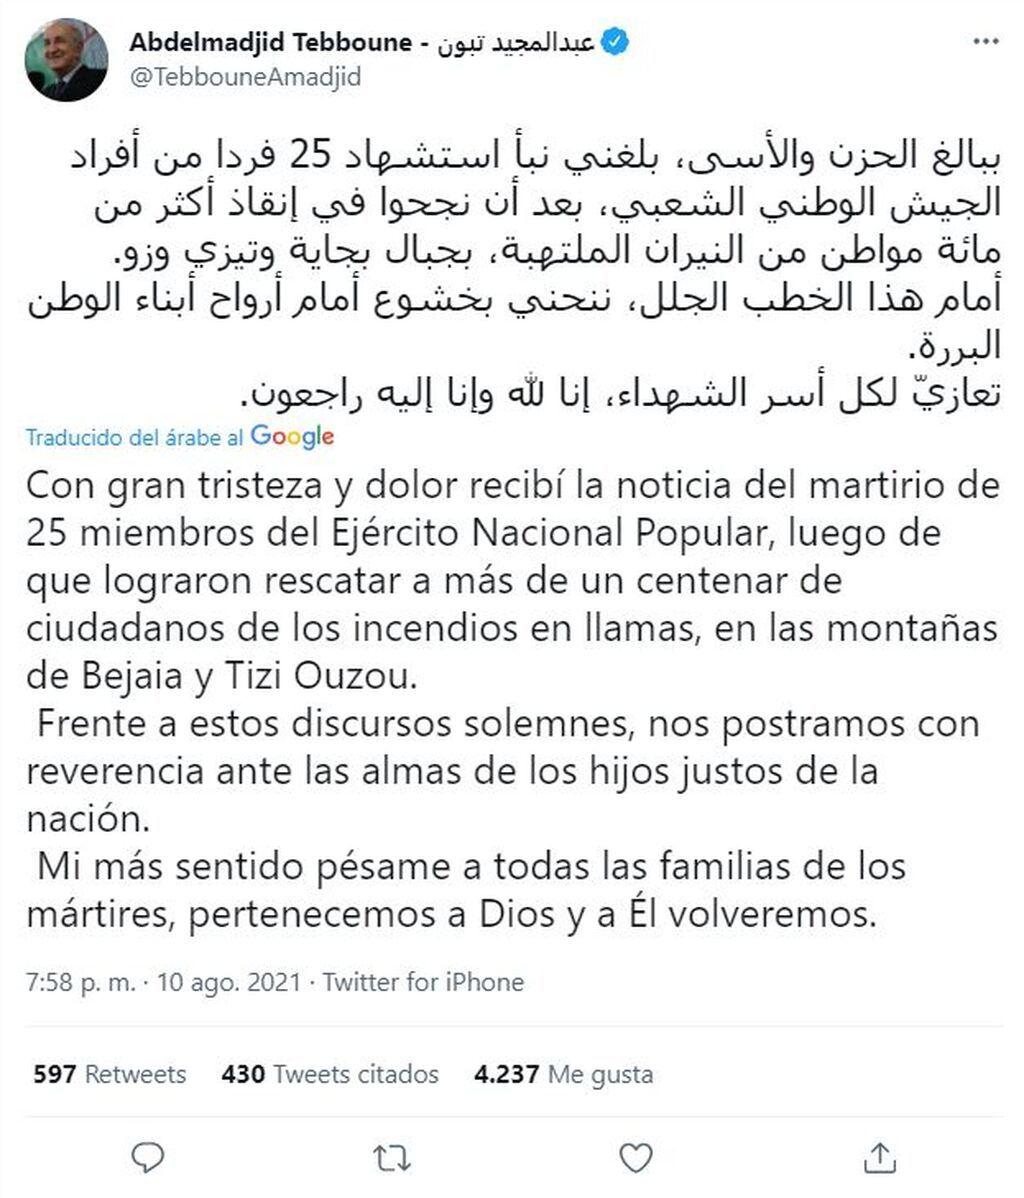 tuit presidente de argelia